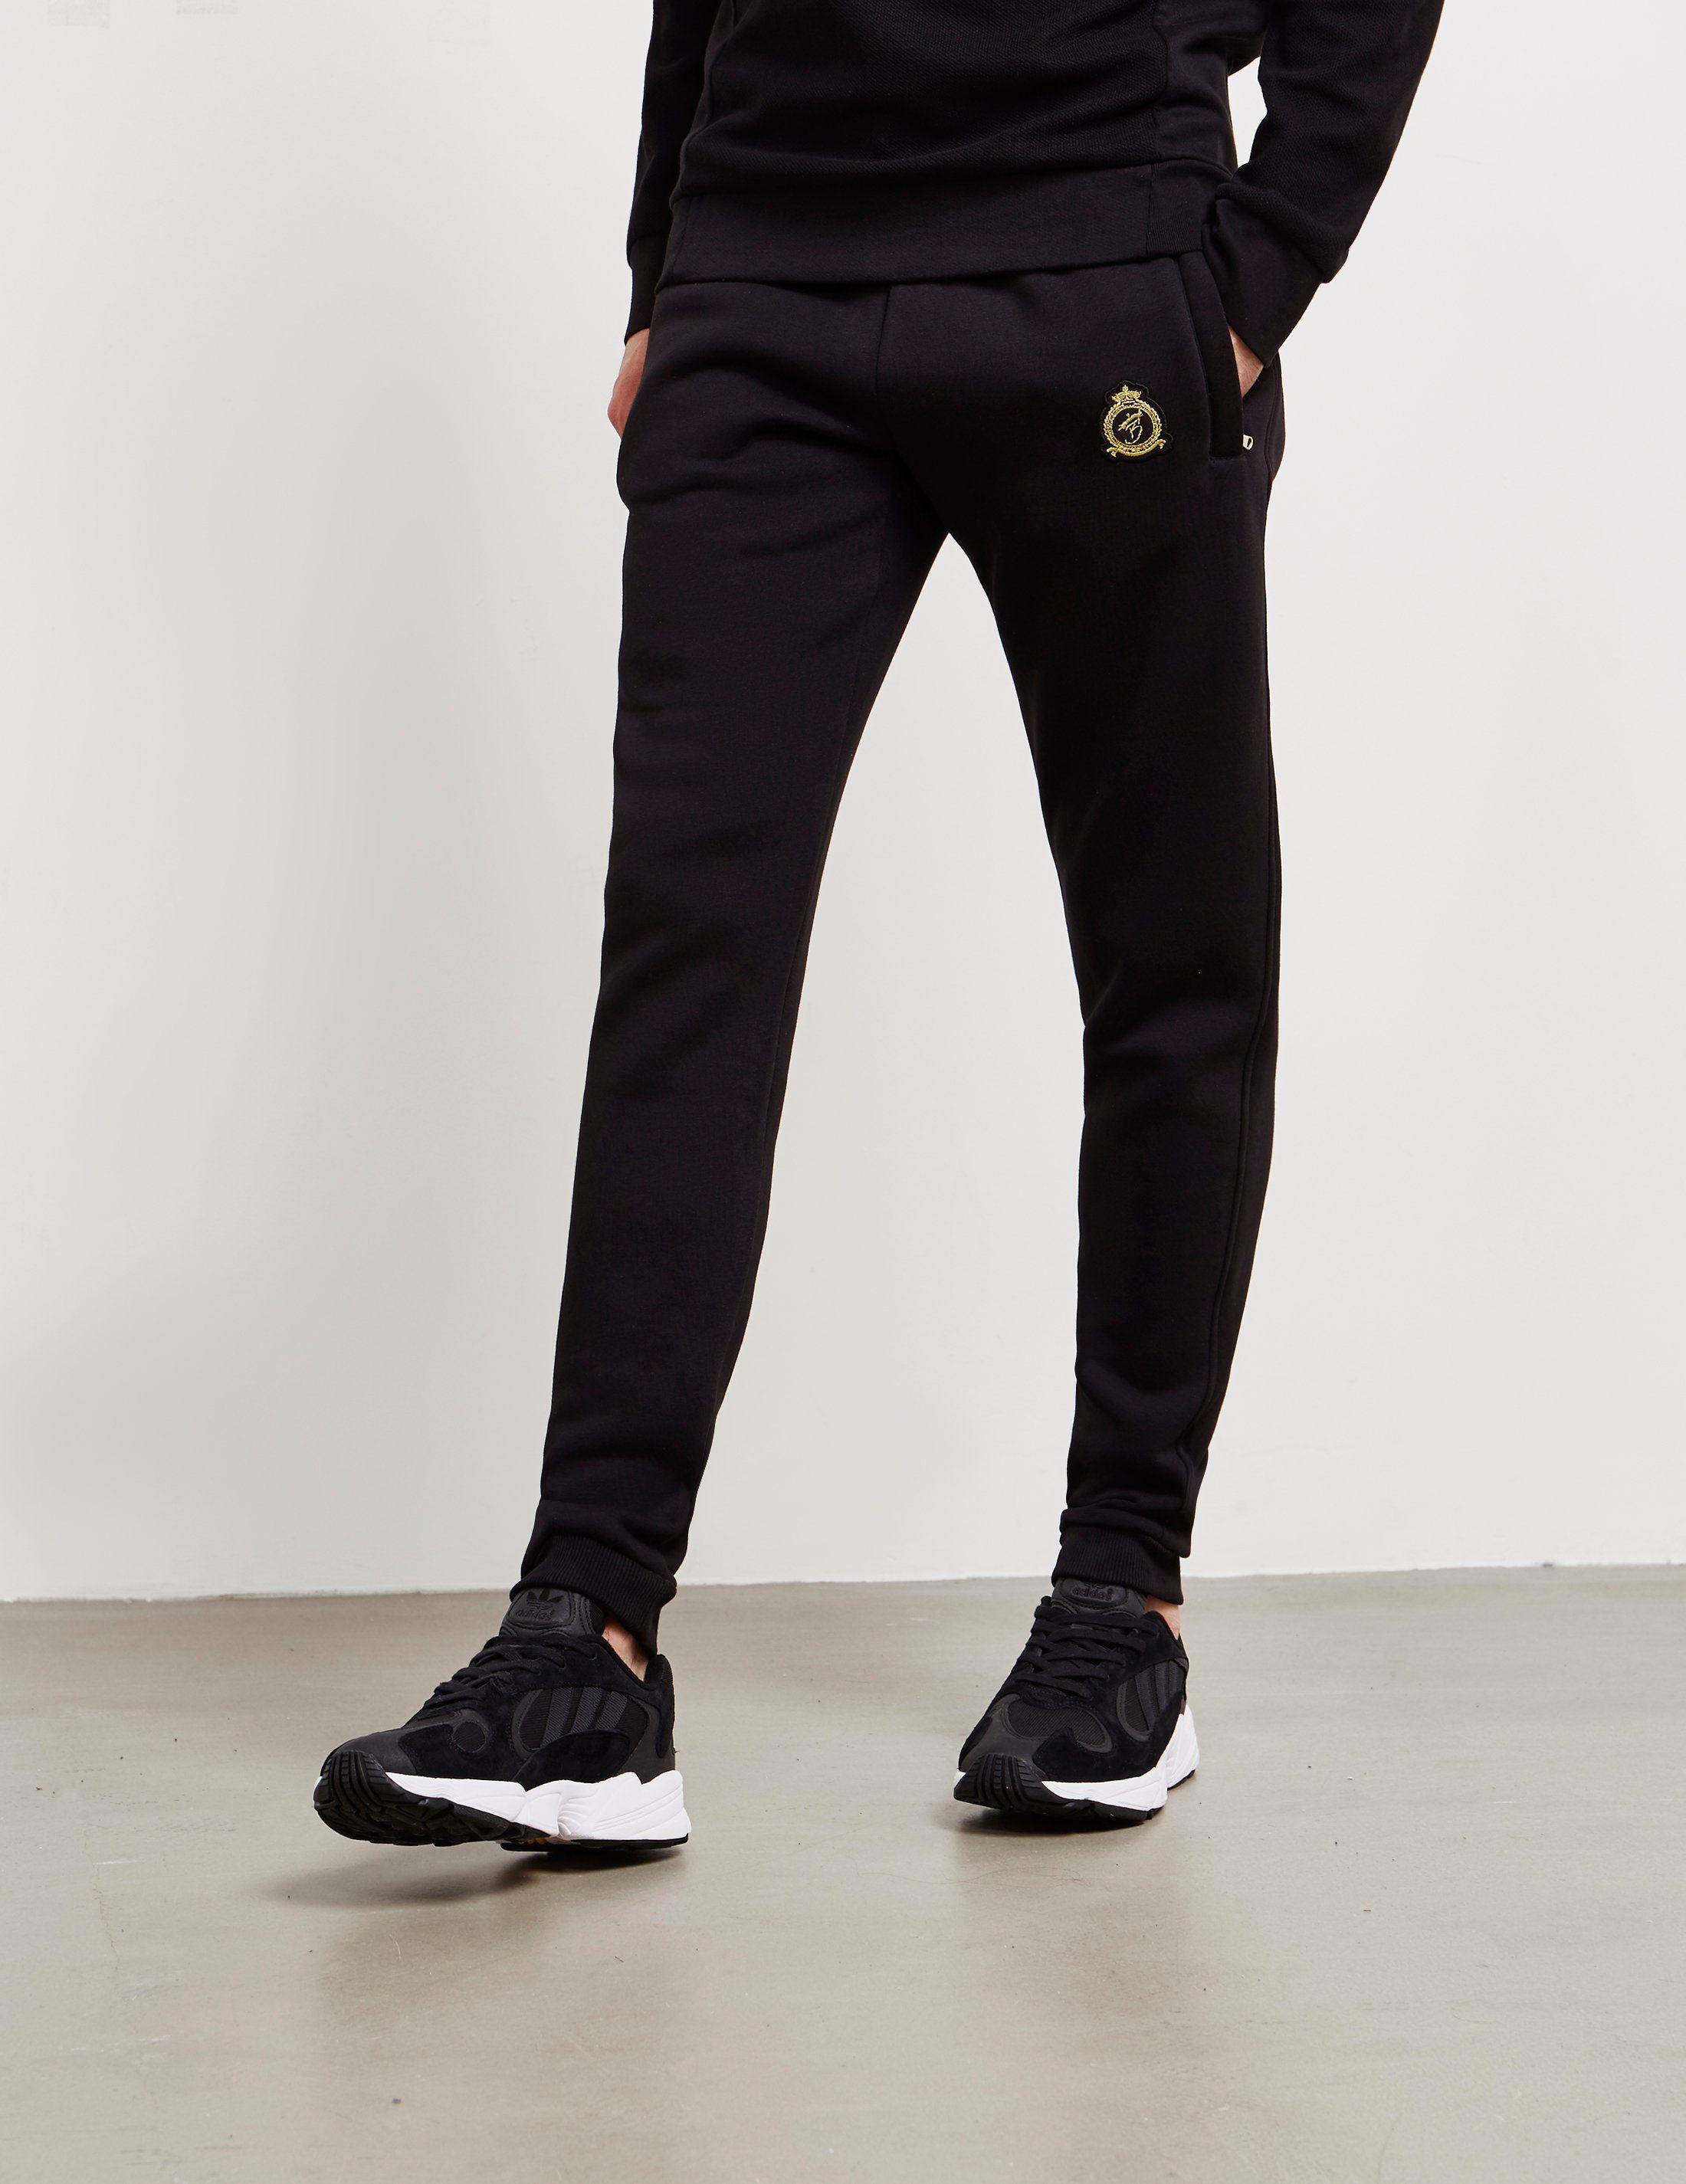 Benjart G Track Pants